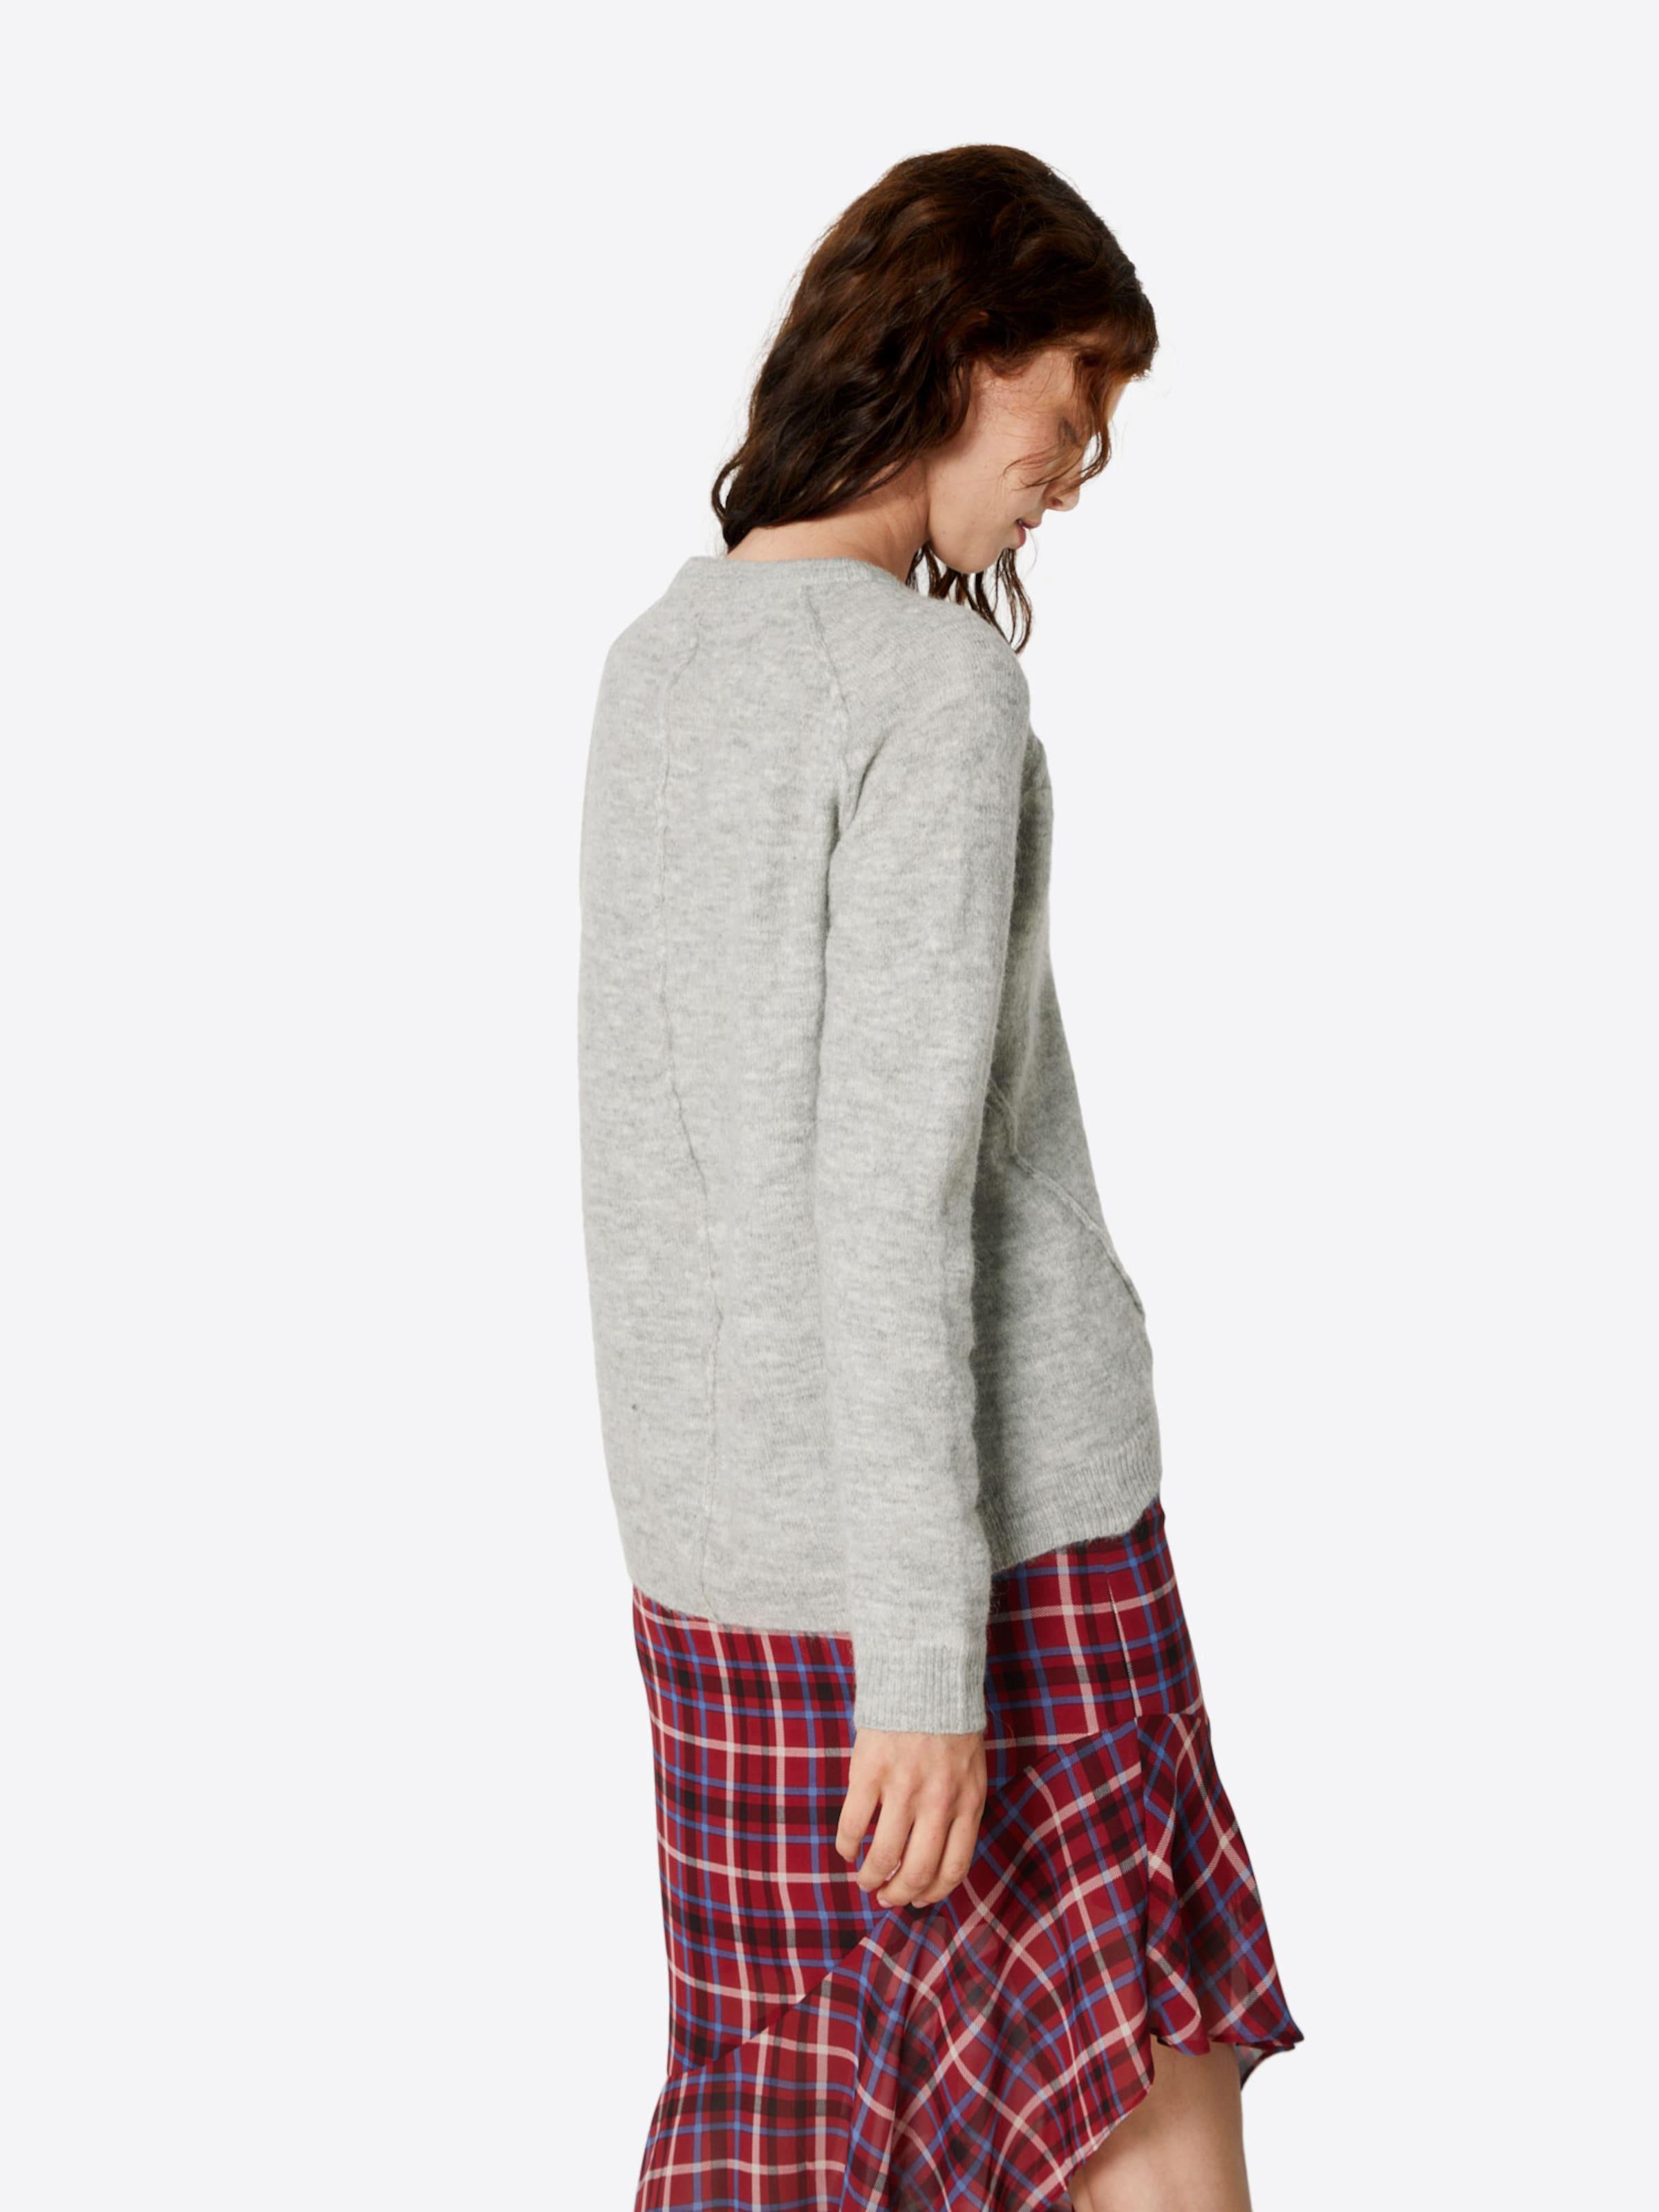 Minimum In Pullover Minimum Minimum Pullover 'kita' Graumeliert Graumeliert In 'kita' Pullover Ym76bgIvfy